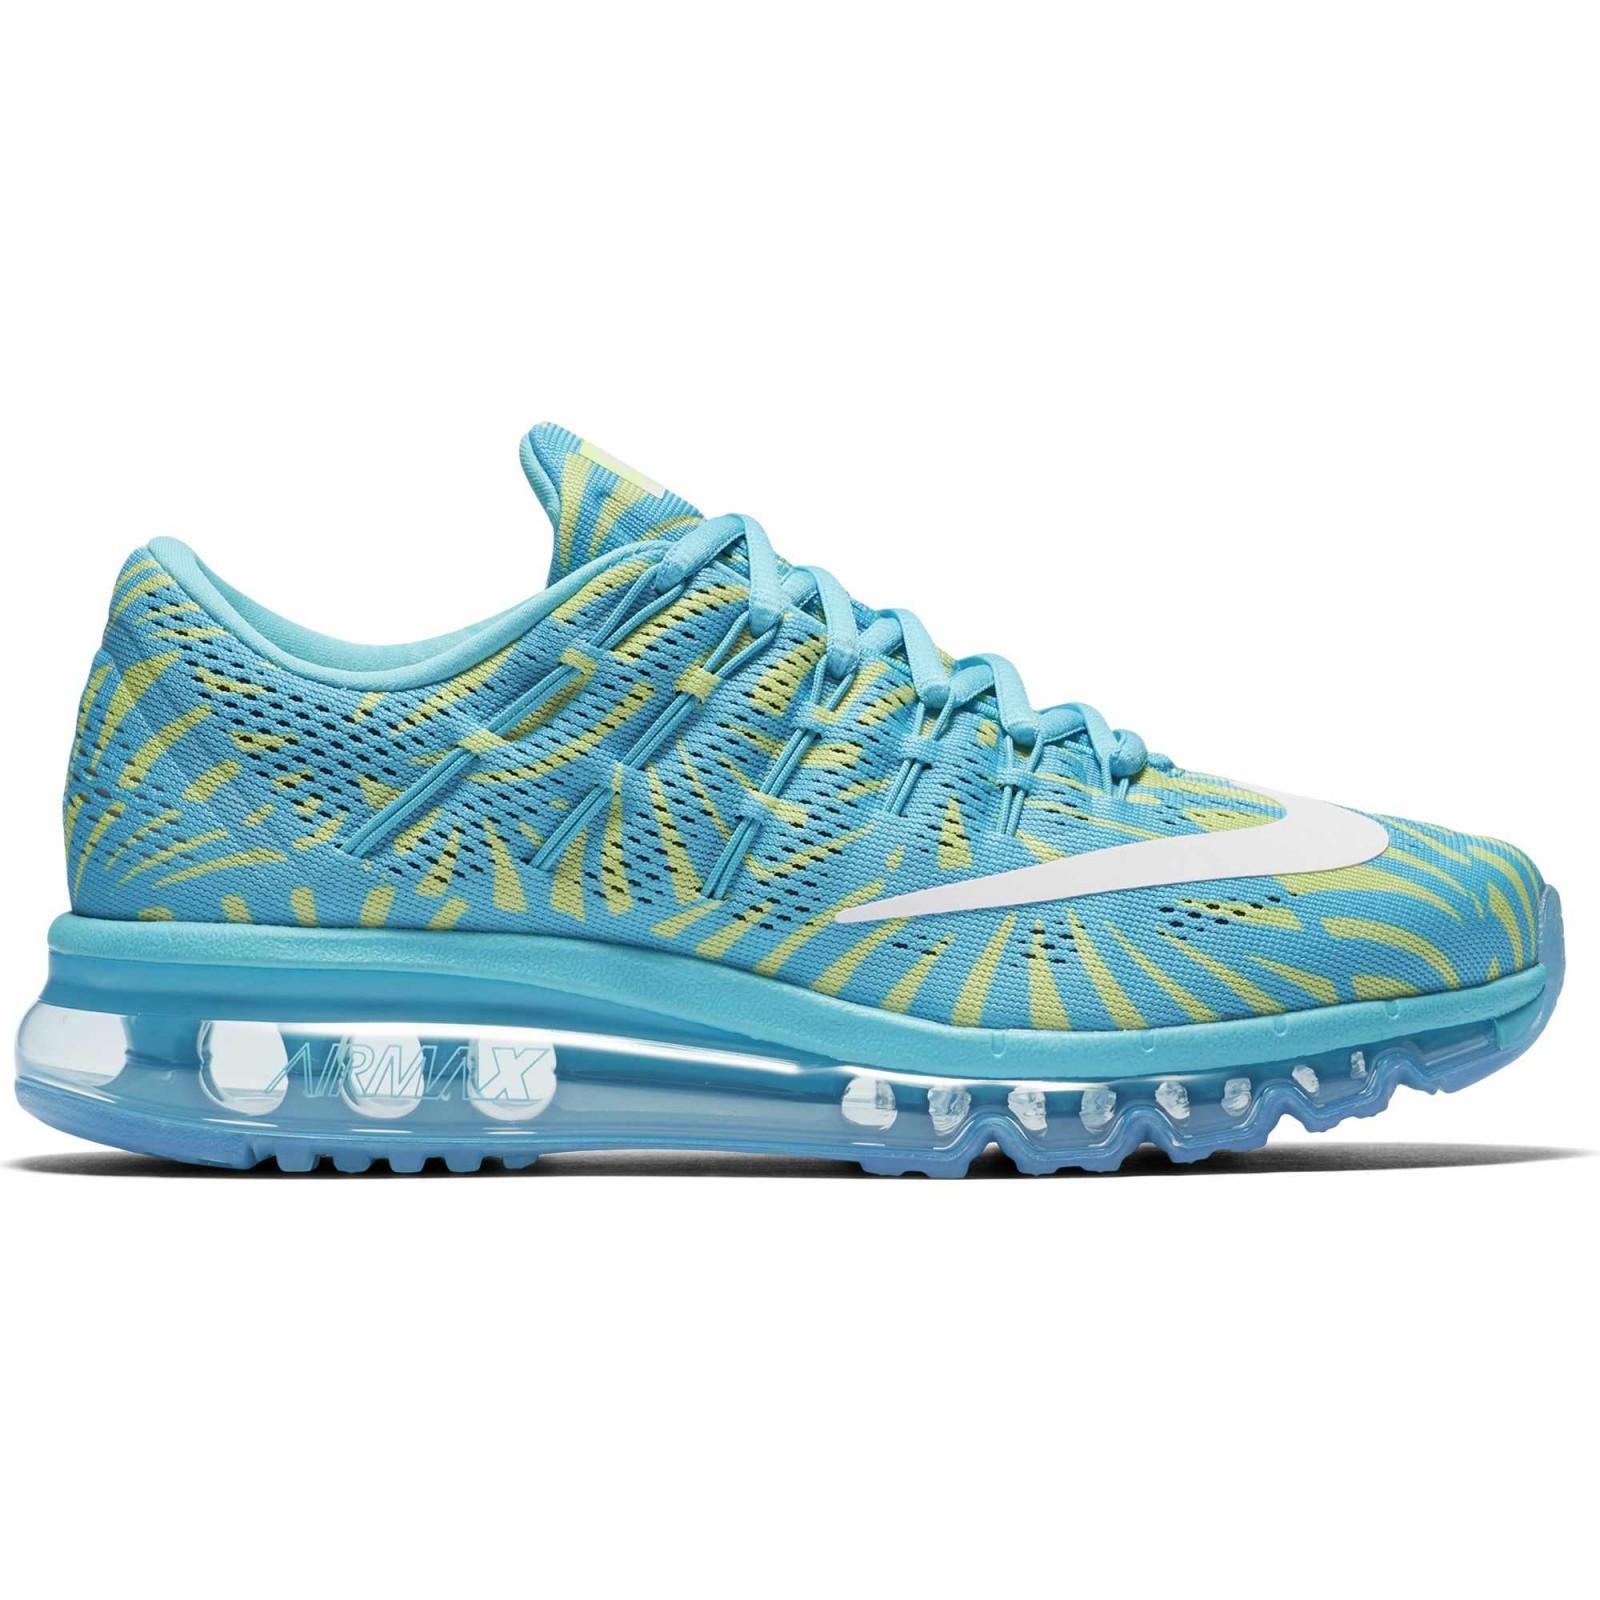 Dámské boty Nike WMNS AIR MAX 2016 PRINT modré  f39519a90f4